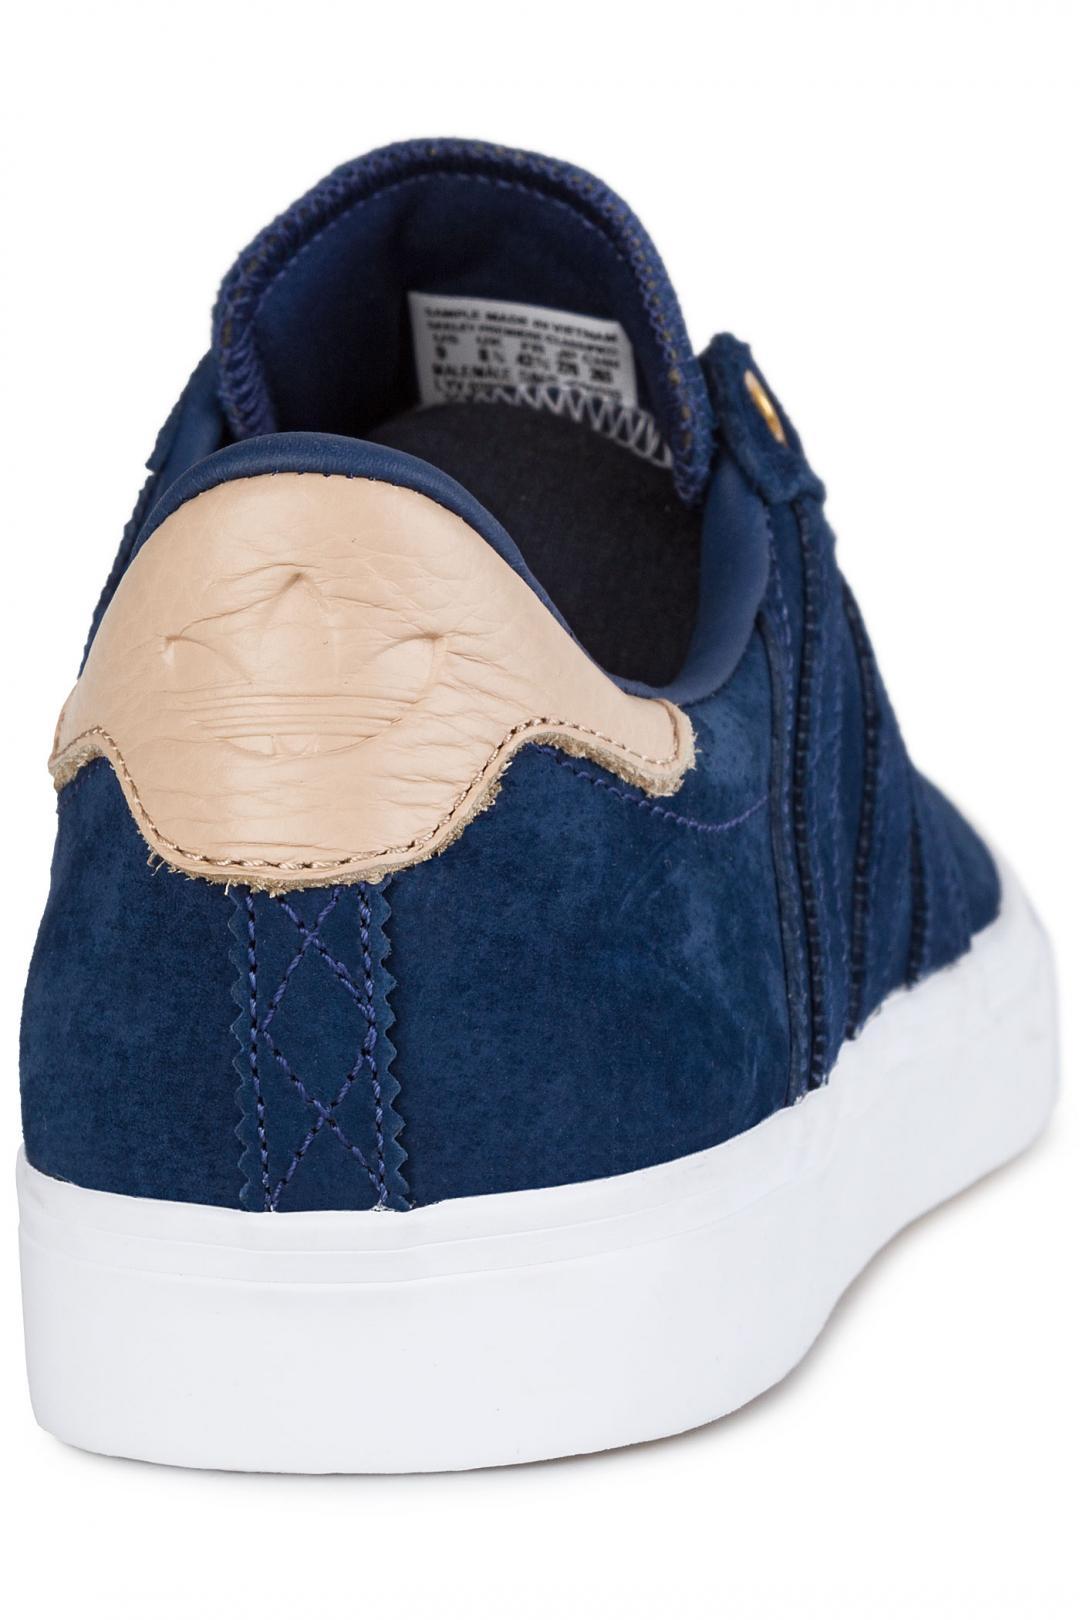 Uomo adidas Seeley Premiere Classified mystery blue supplier colour whi | Scarpe da skate